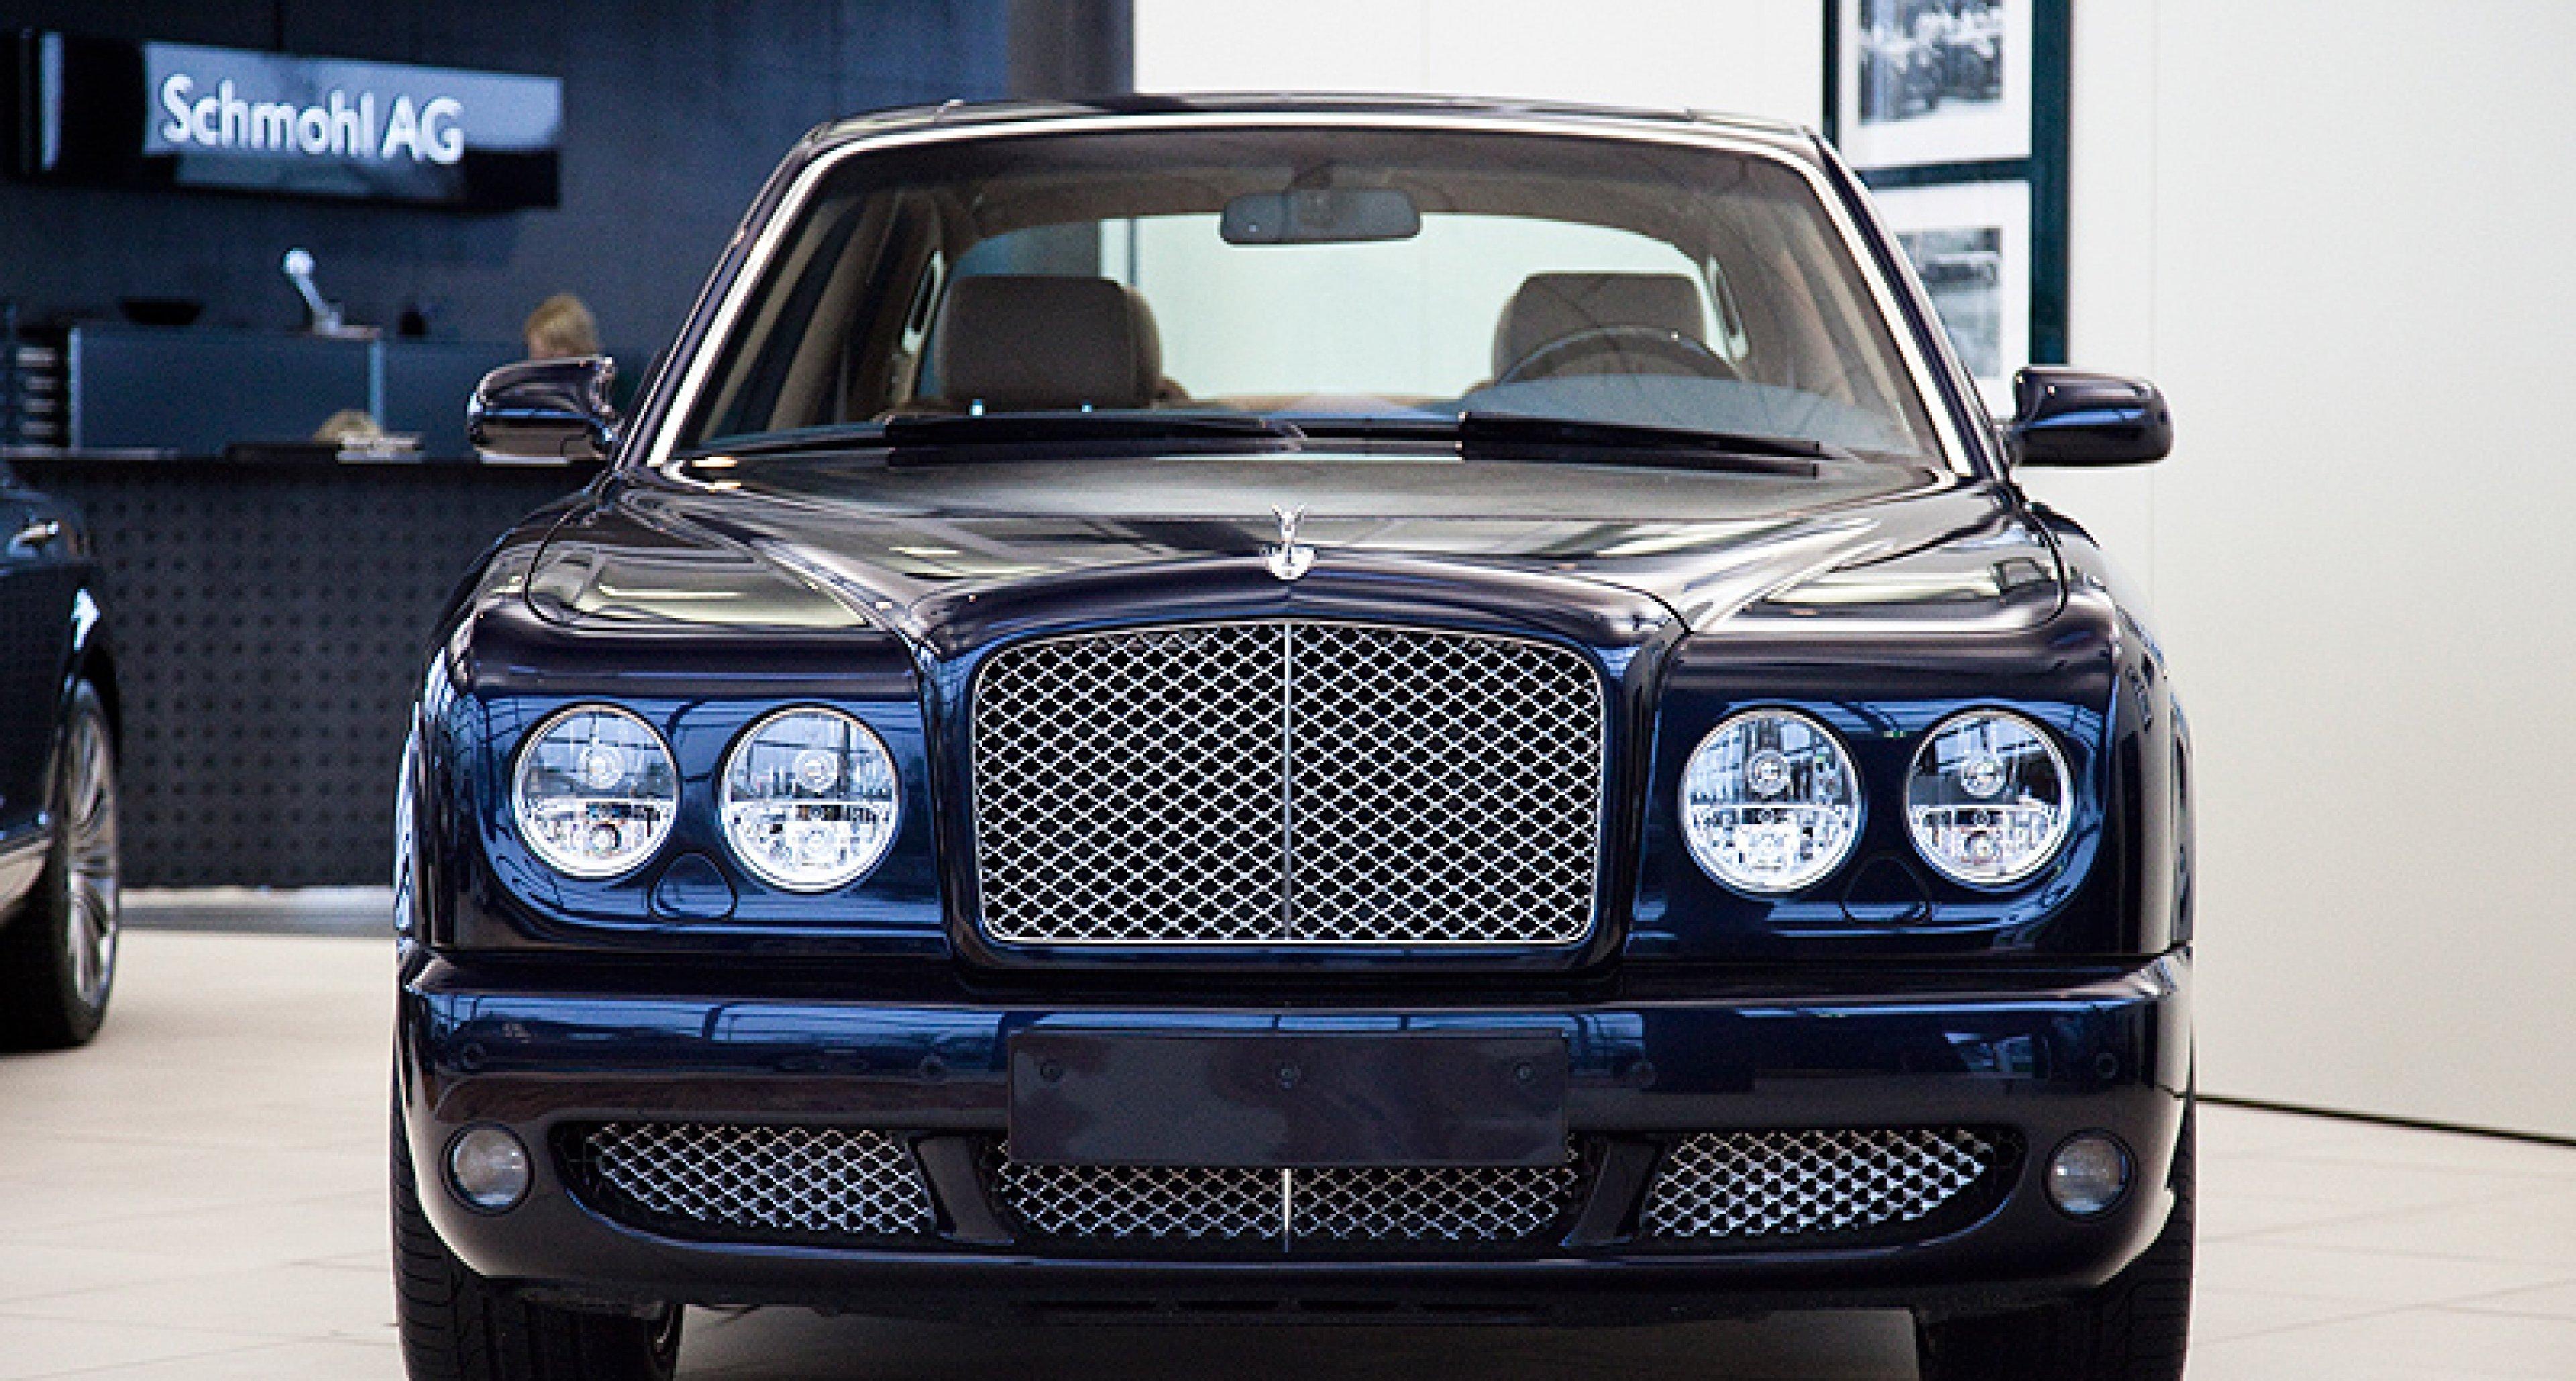 Editor's Choice: Bentley Arnage T Final Series